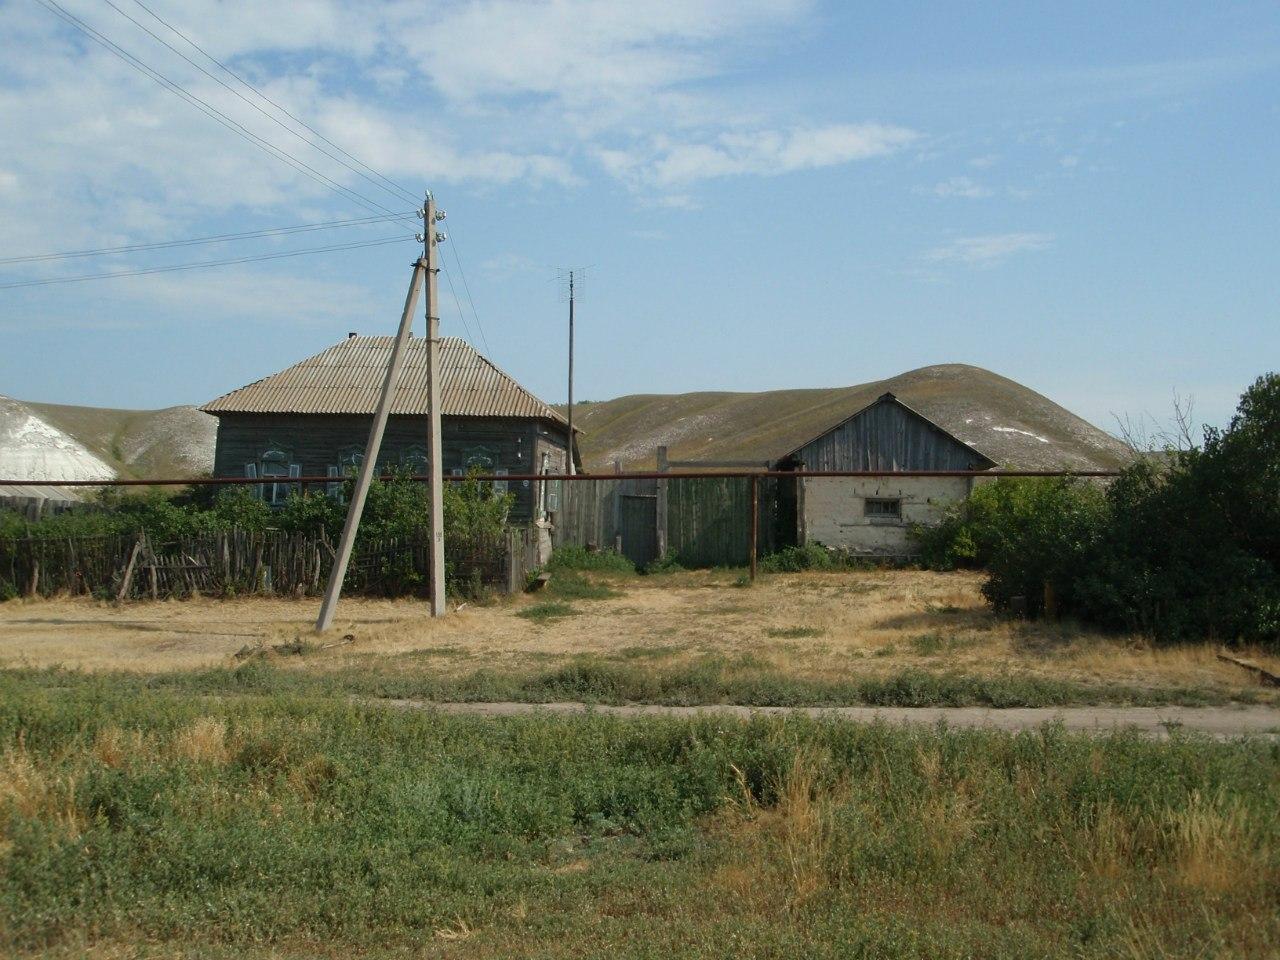 Село Белогорное старообрядческий центр